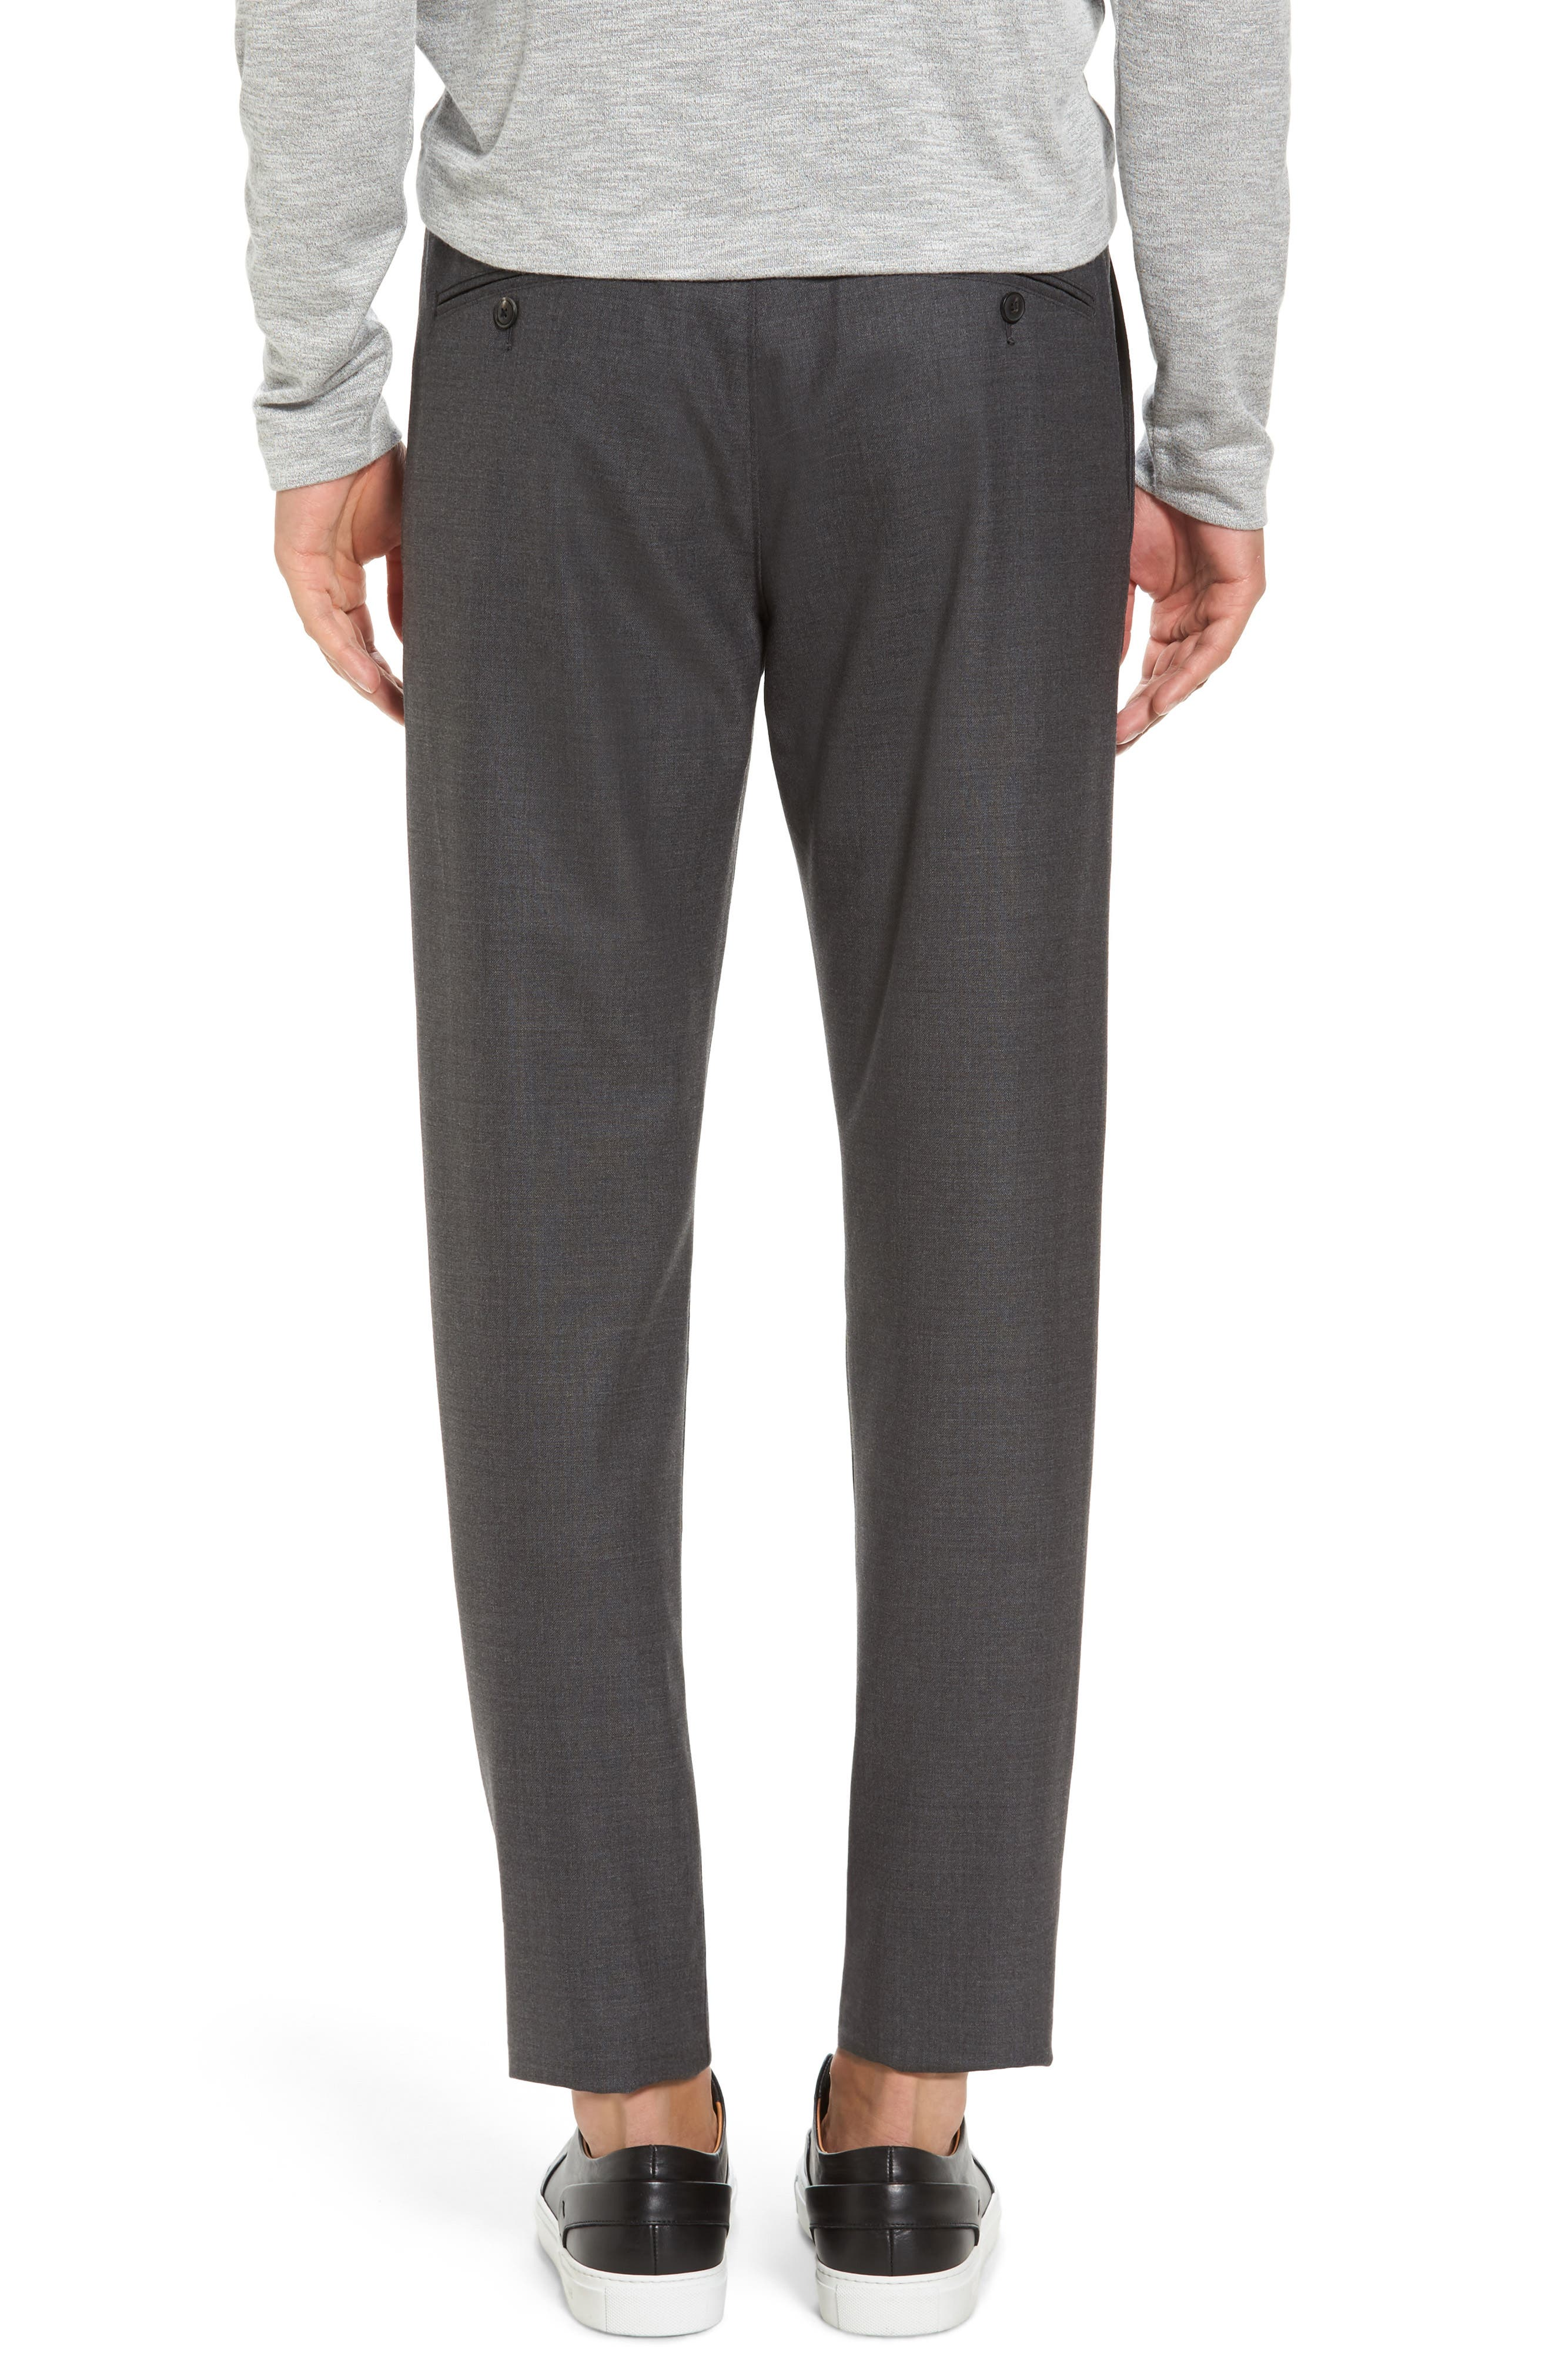 Zaine Gearheart Slim Straight Pants,                             Alternate thumbnail 2, color,                             Medium Charcoal